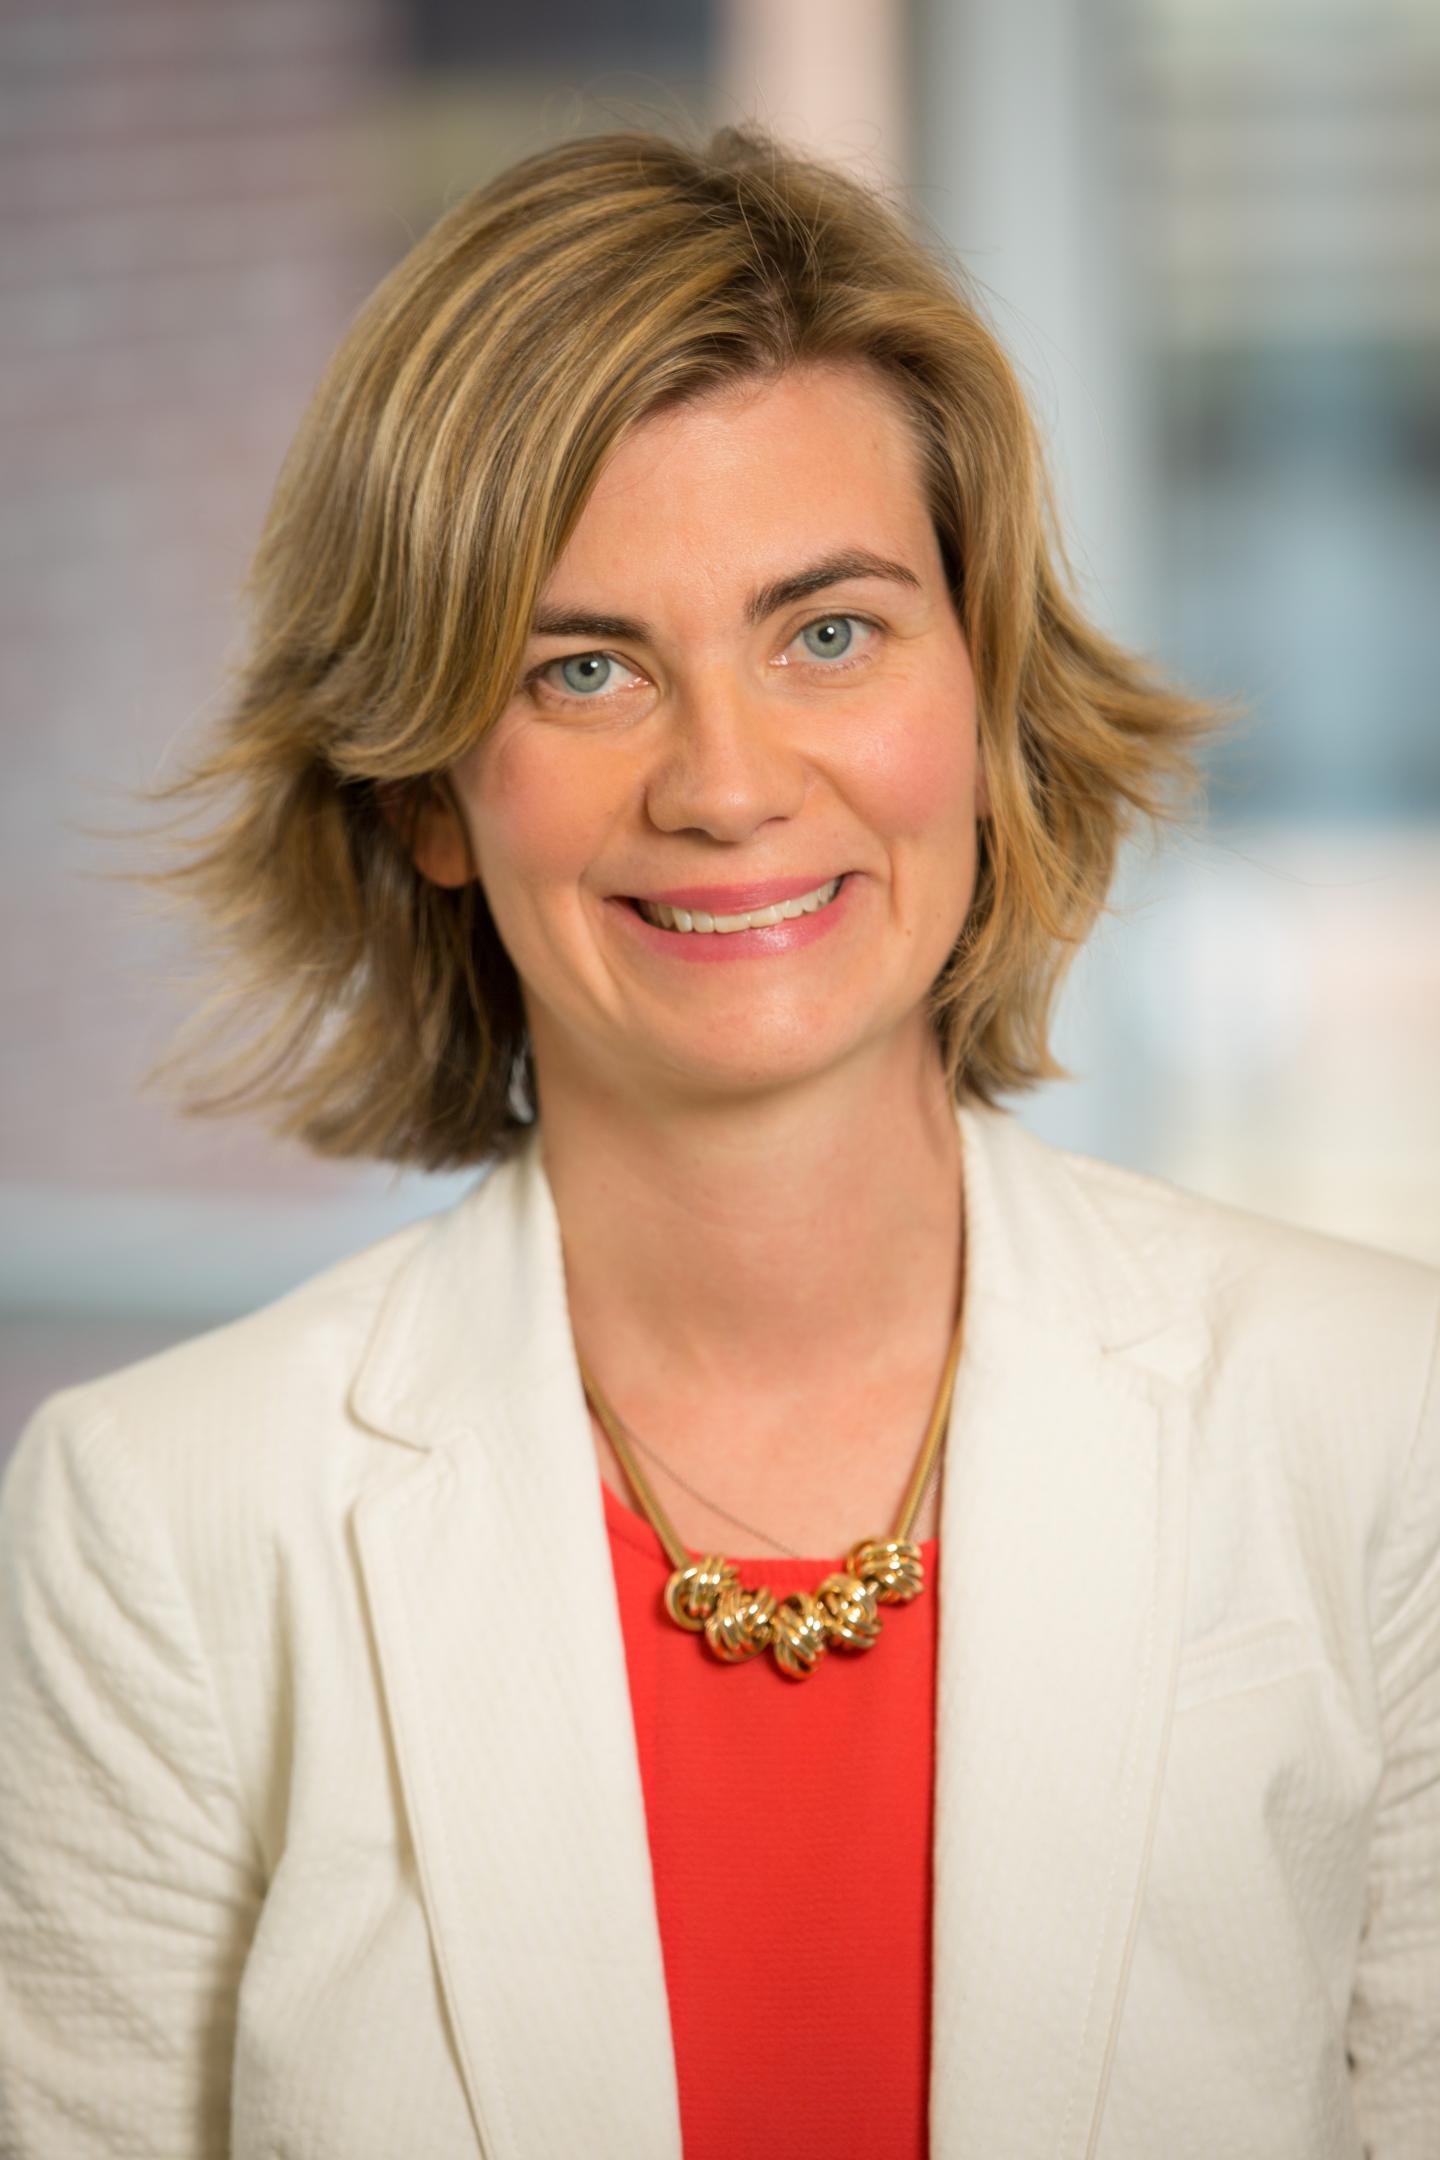 Meg Zomorodi, University of North Carolina Health Care